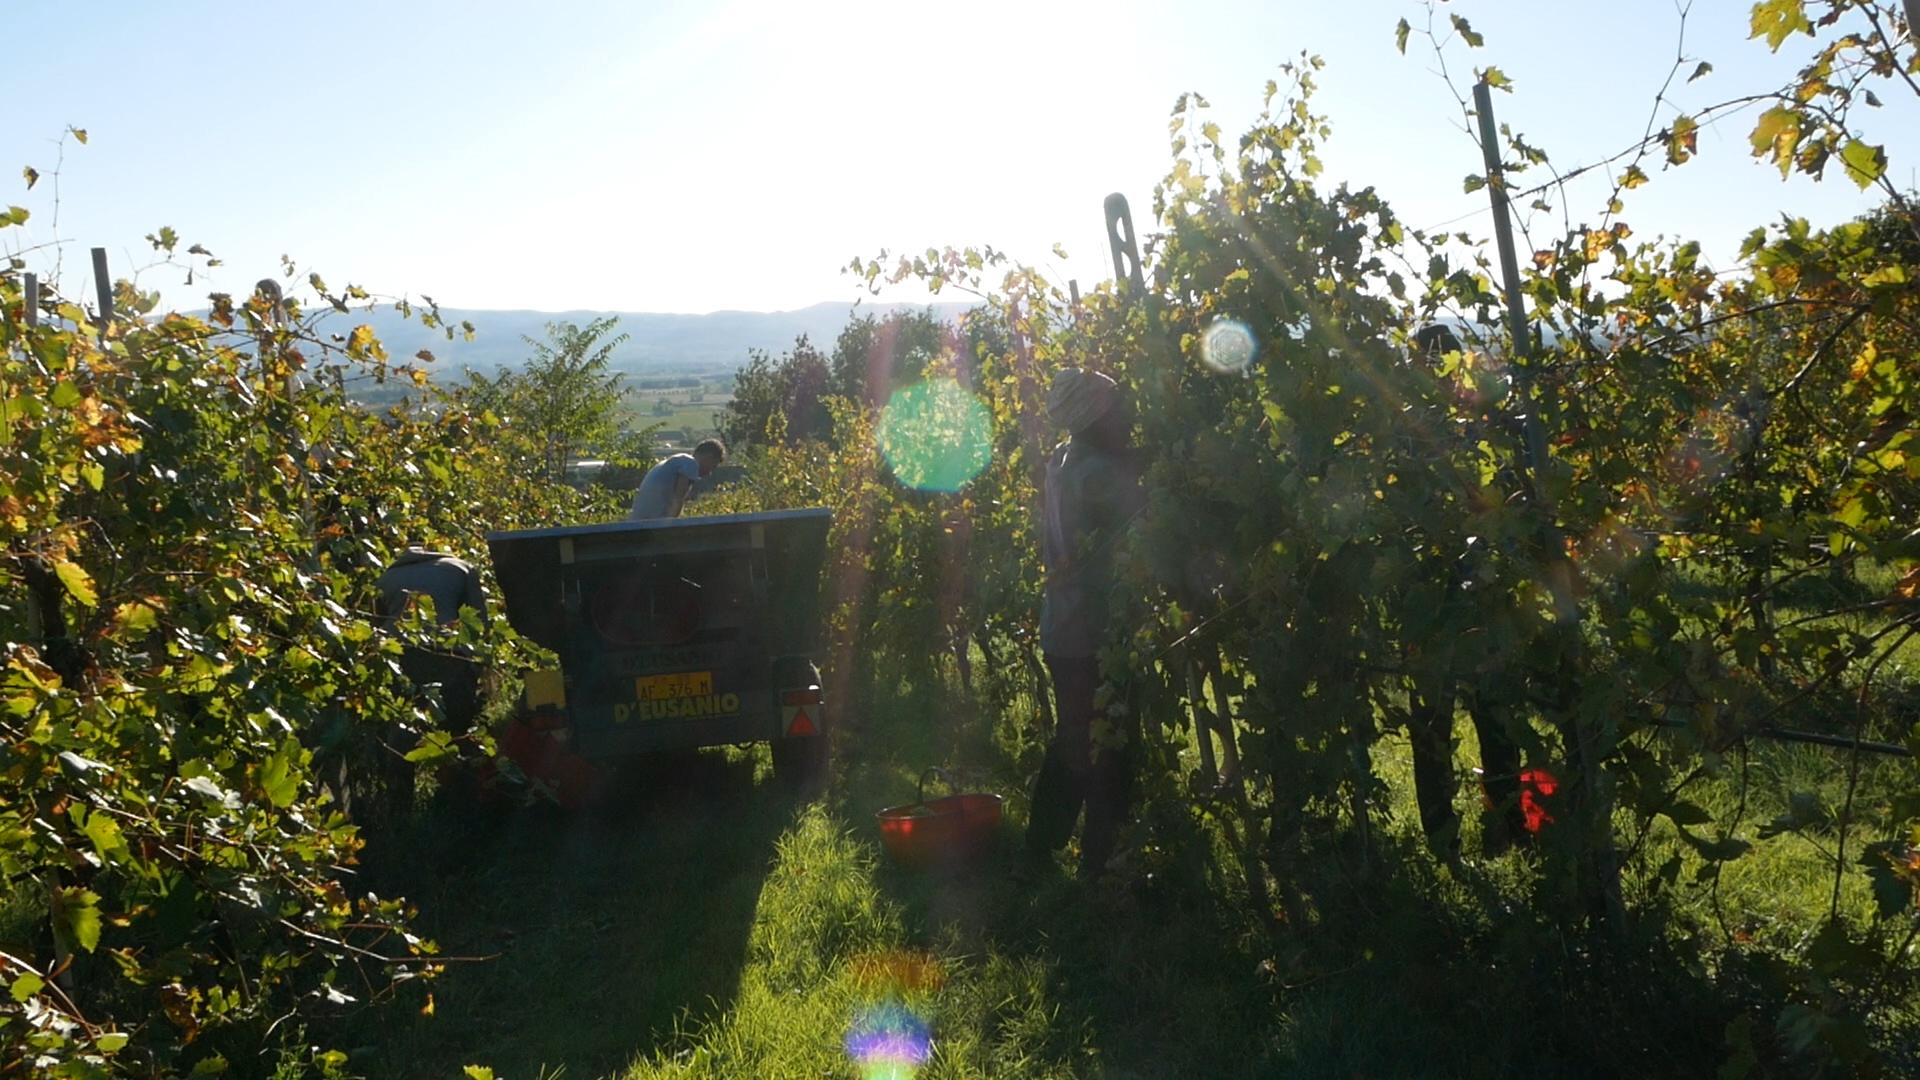 Esperienza sensoriale Assisi Tili Vini - Vendemmiamo insieme 2